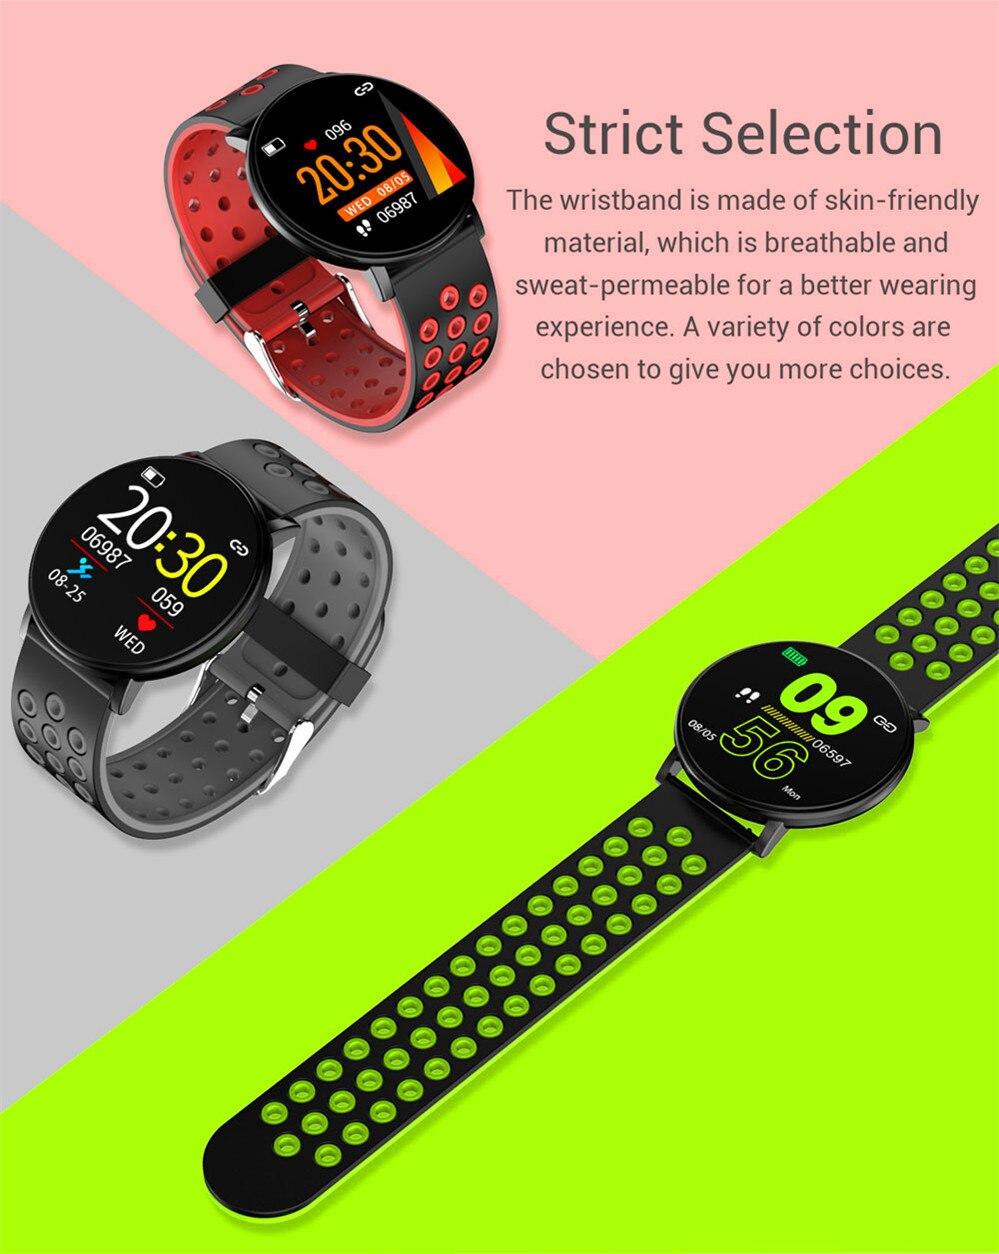 H370f1e7a6b764bf2957773e209c4b39f2 Smart Fitness Bracelet Blood Pressure Measurement Fitness Tracker Waterproof IP67 Smart Band Watch Heart Rate Monitor Pedometer